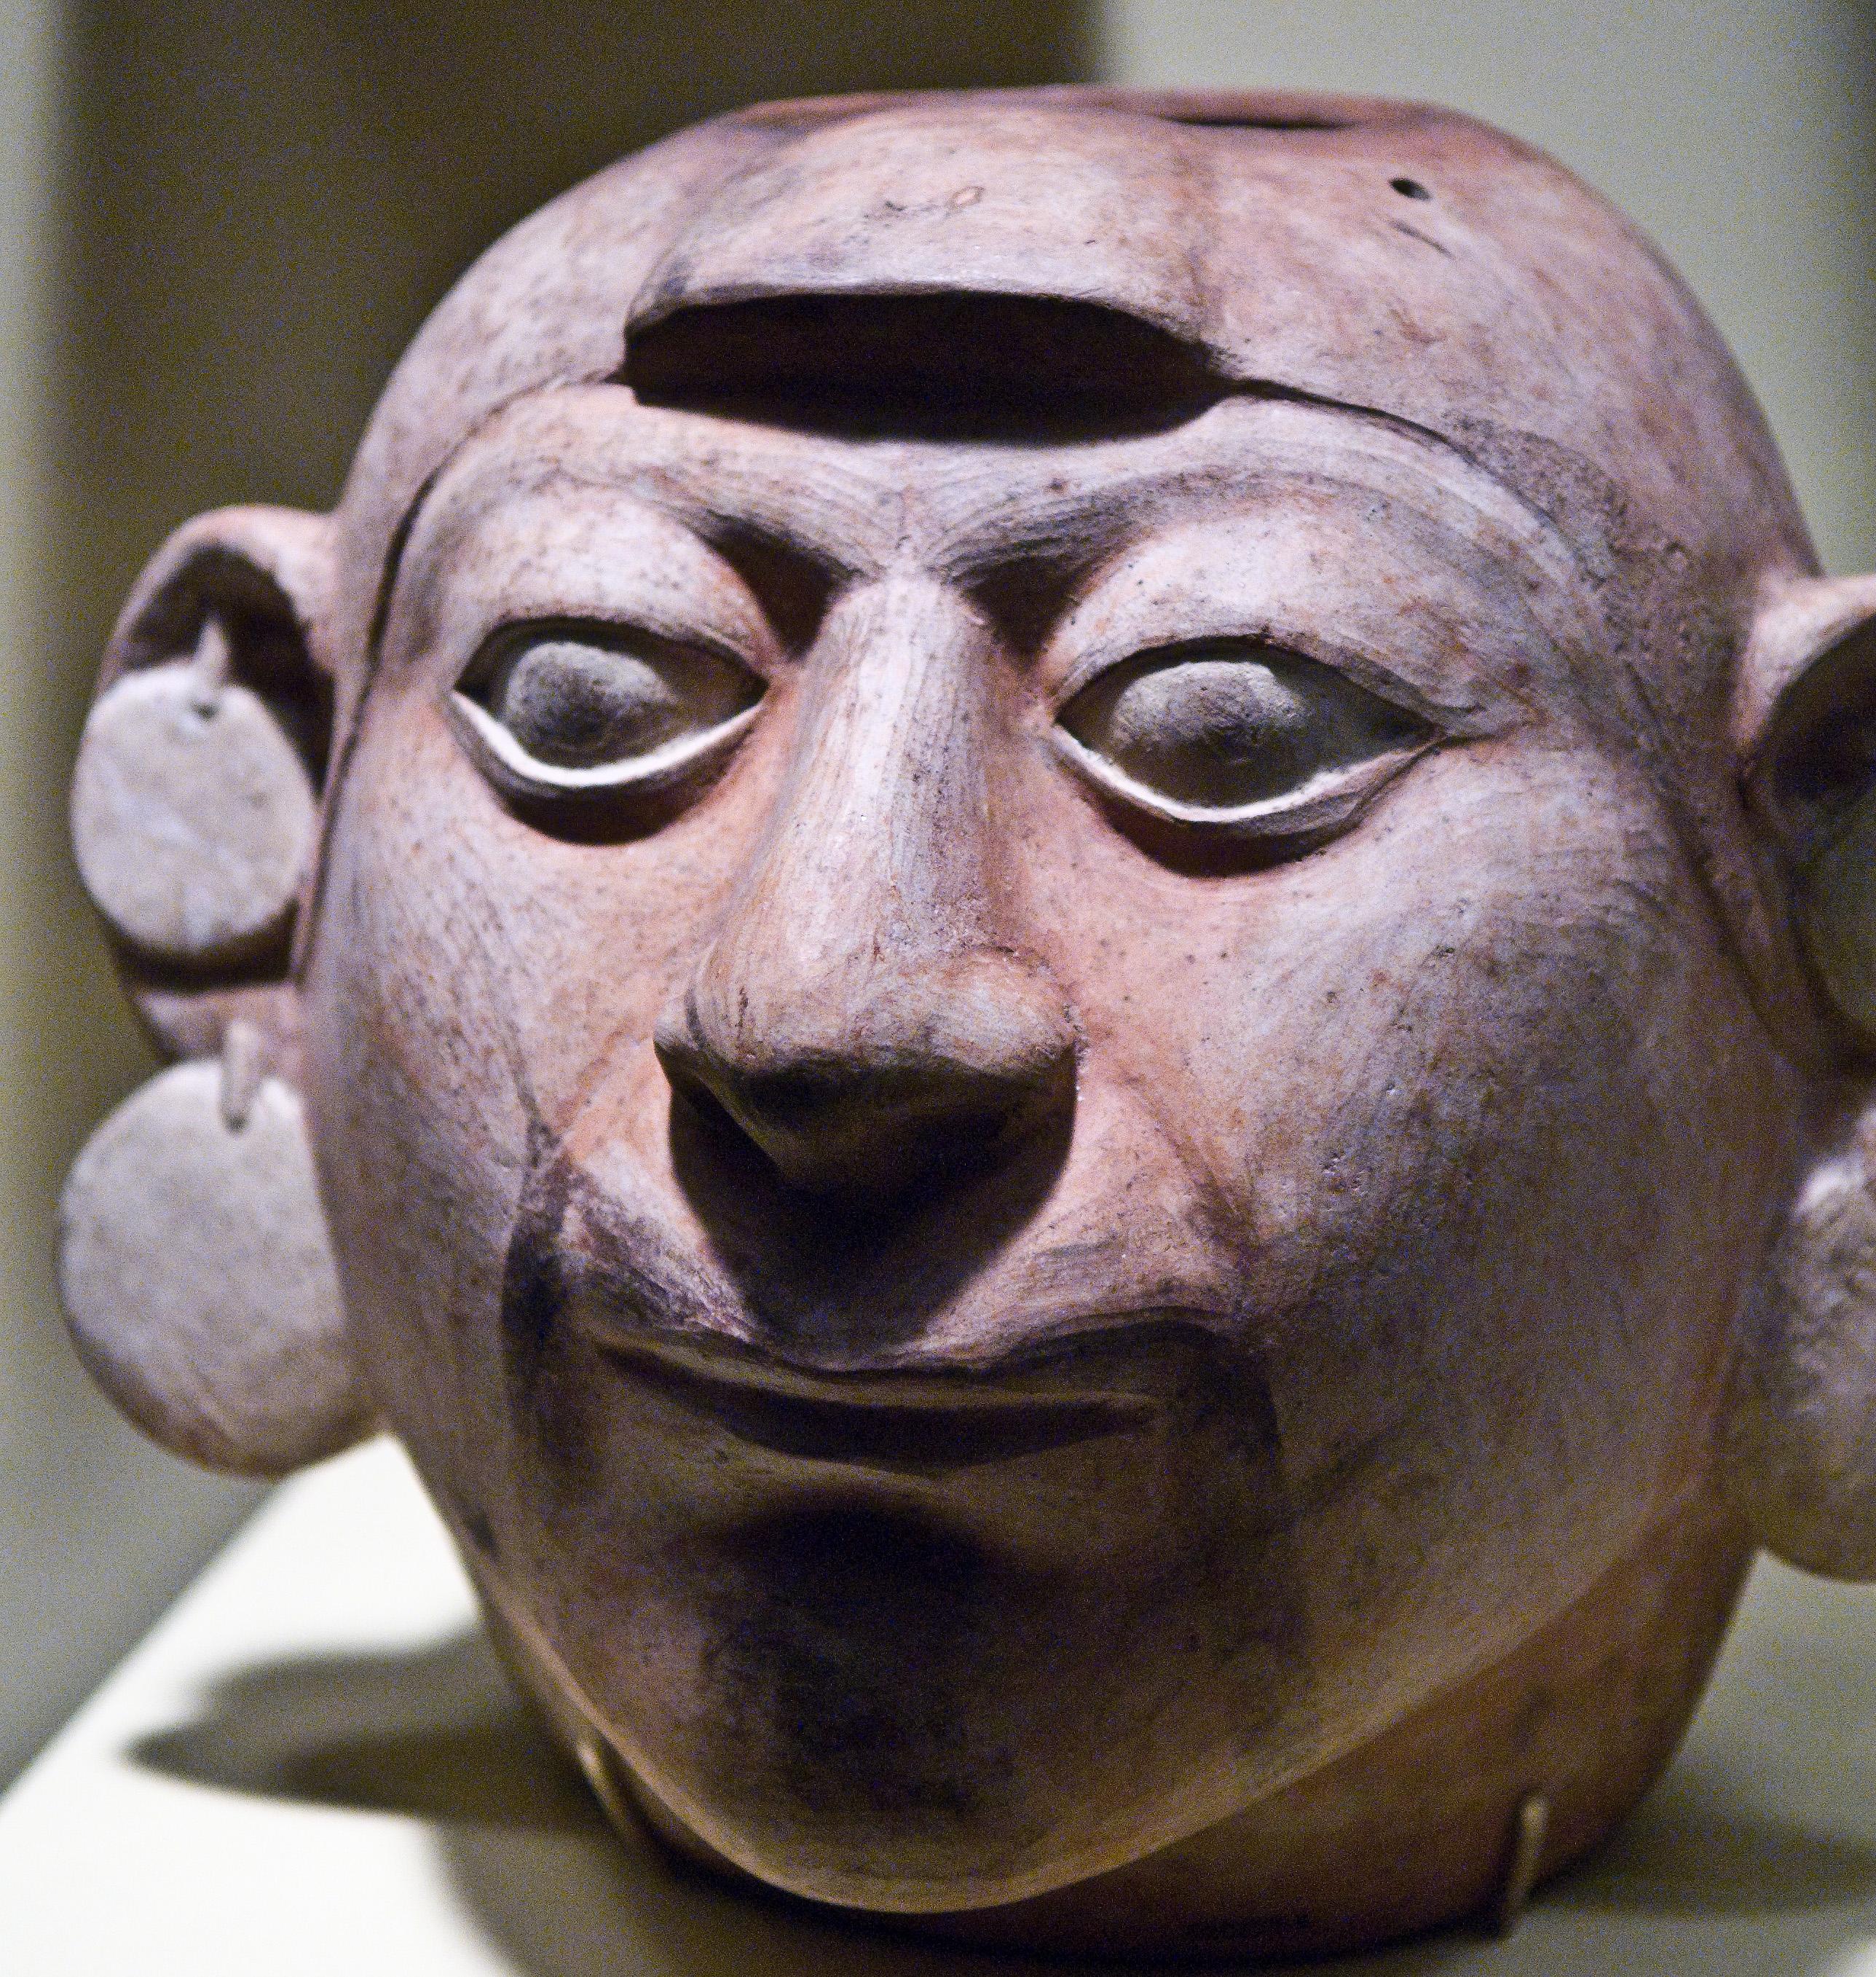 Head sculpture from the Moche civilization